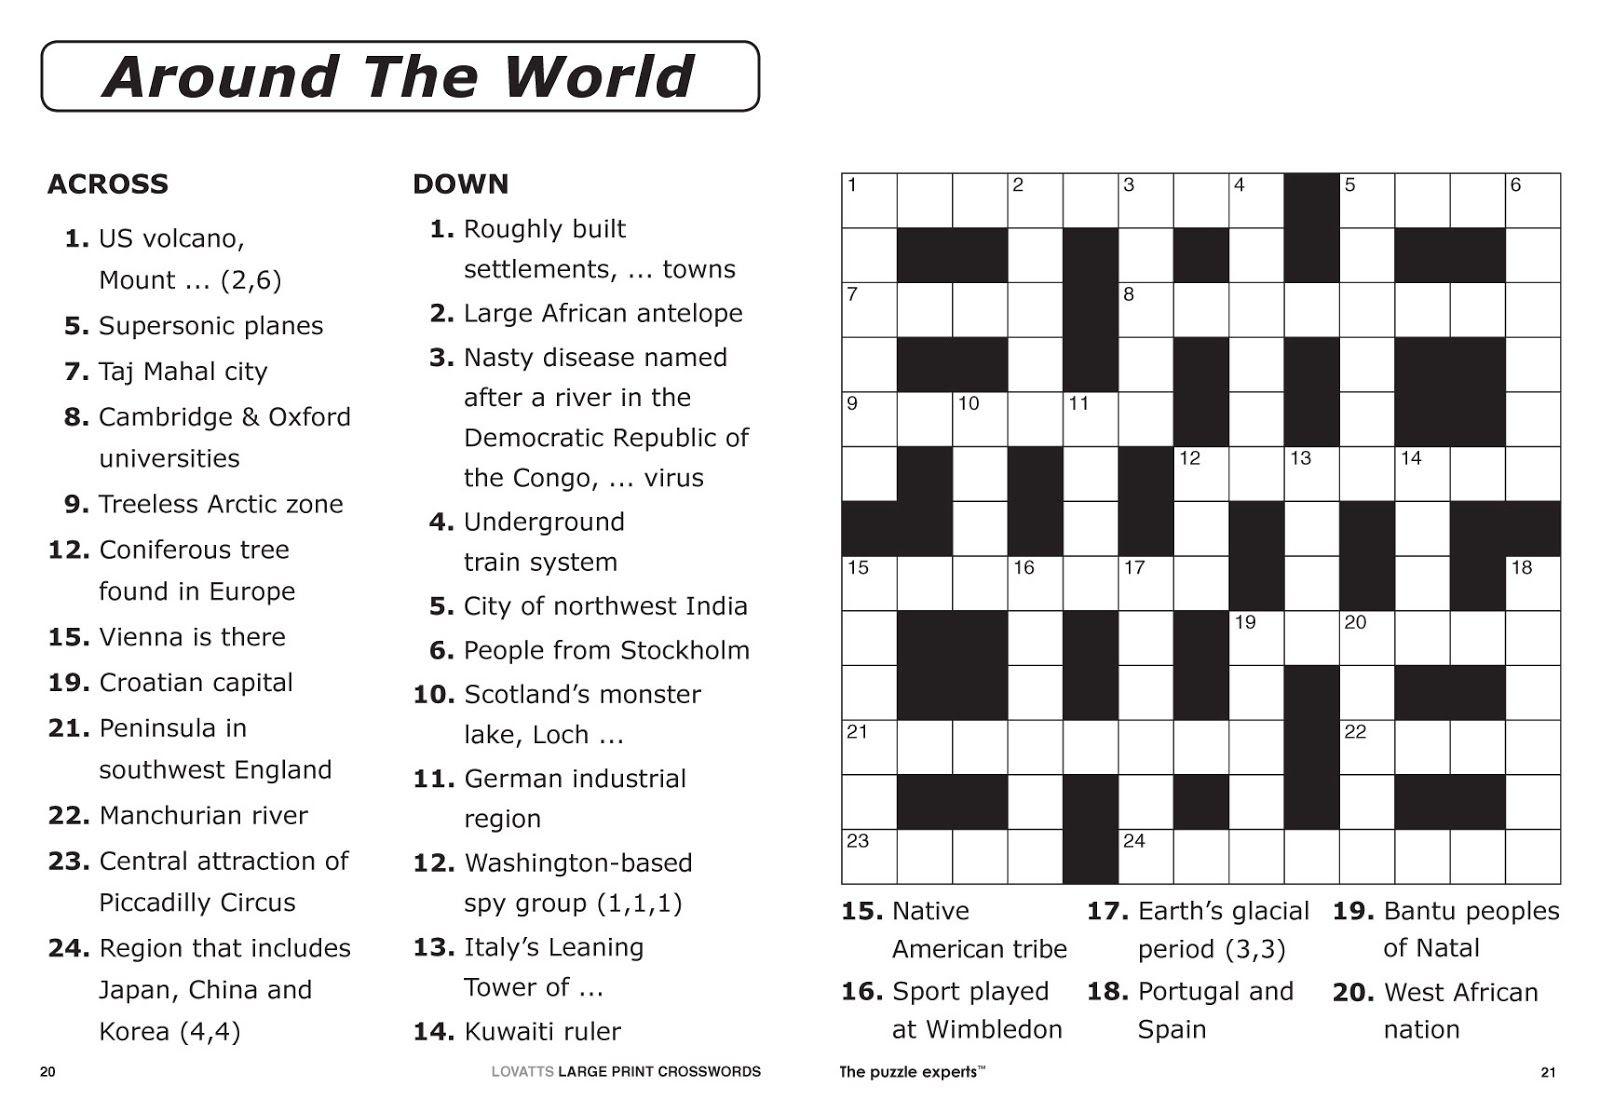 Free Printable Large Print Crossword Puzzles | M3U8 - Printable Crossword Puzzles By Topic